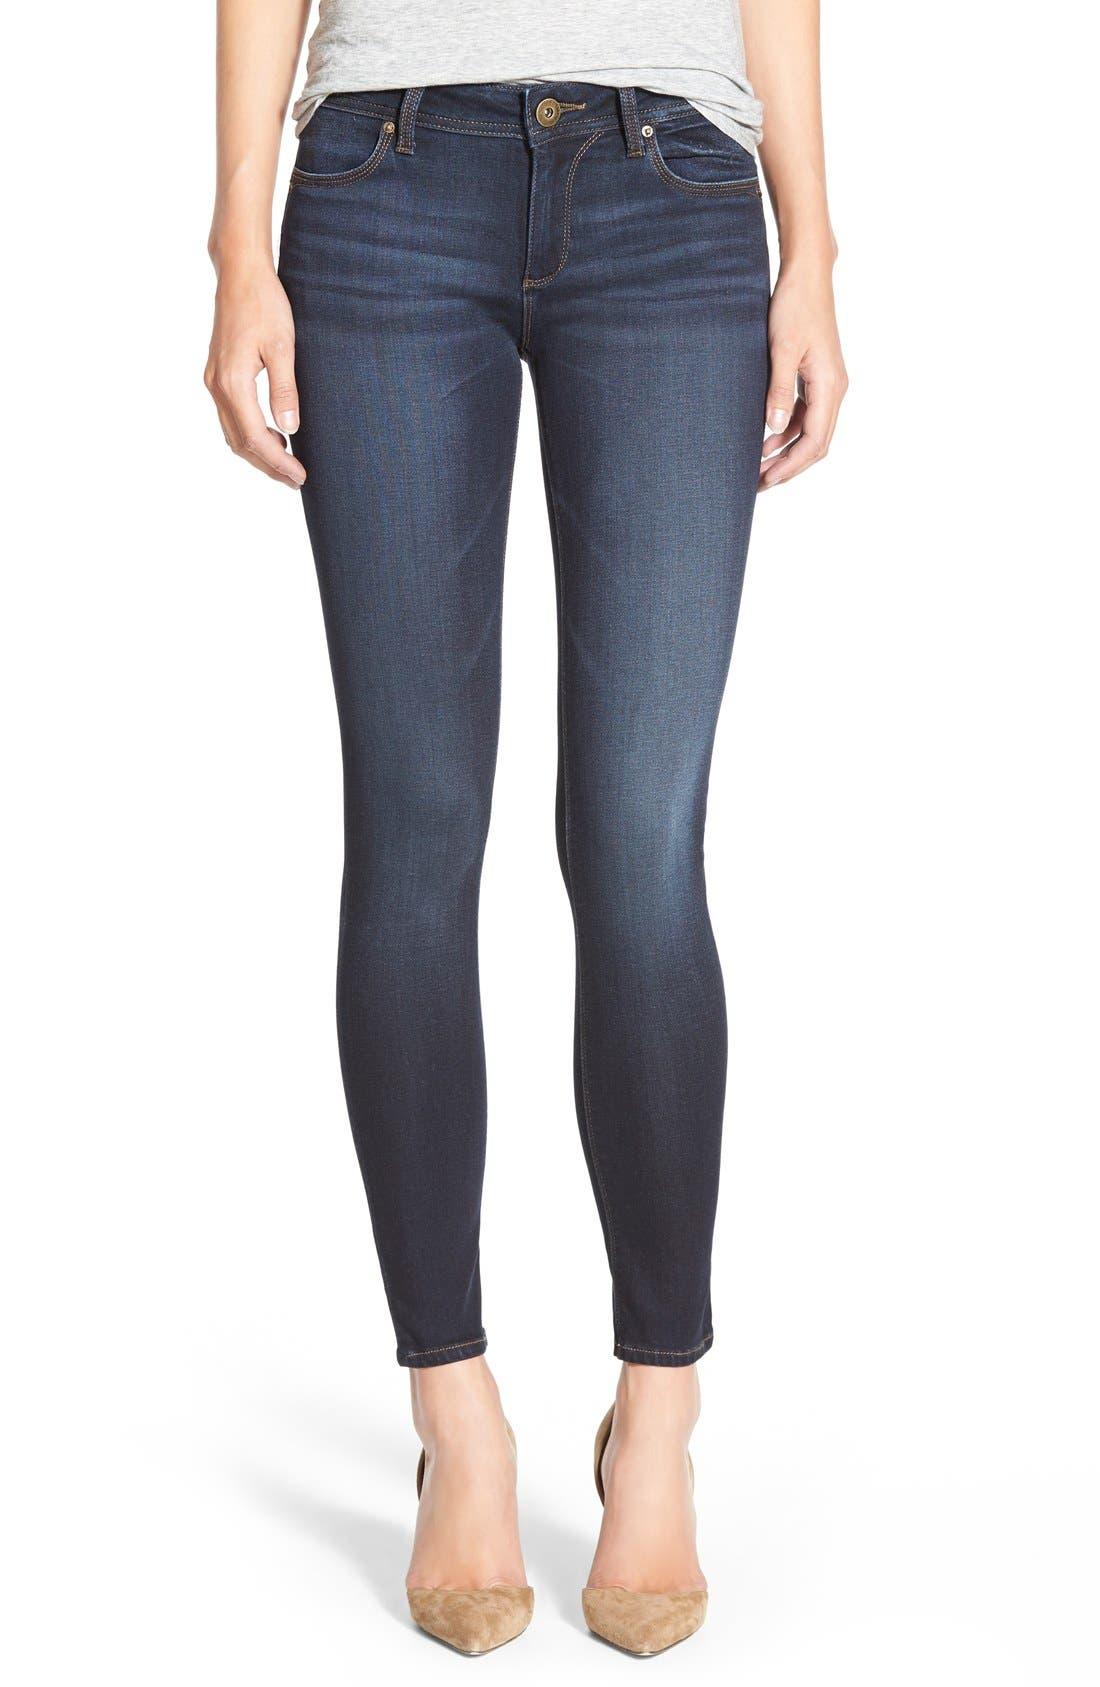 DL1961 'Emma' Power Legging Jeans (Walton)